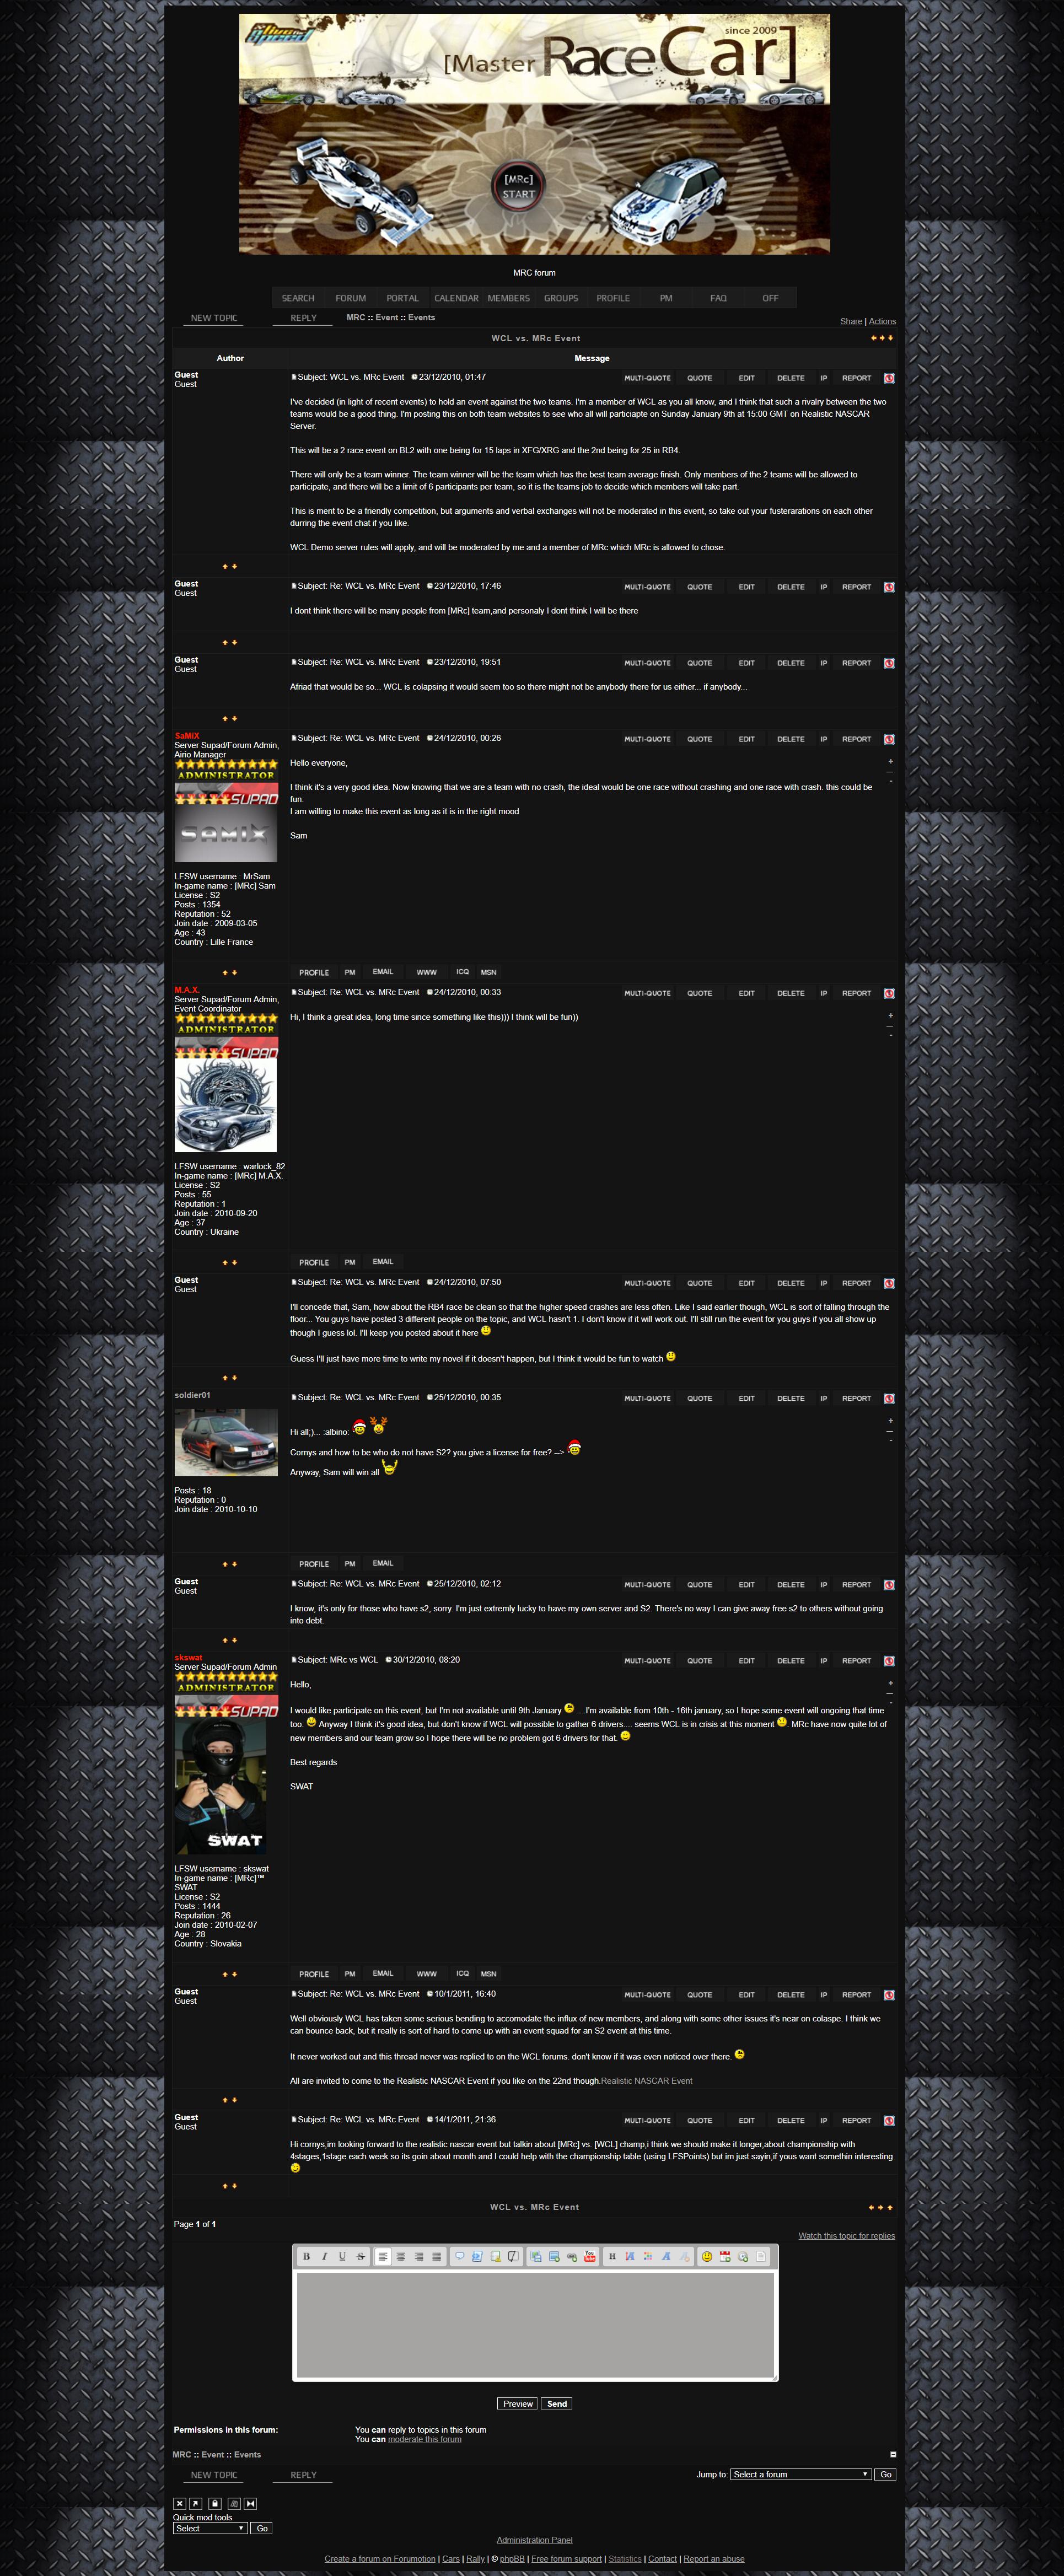 [Image: screencapture-masterracecar-forumactif-t...-52-15.jpg]